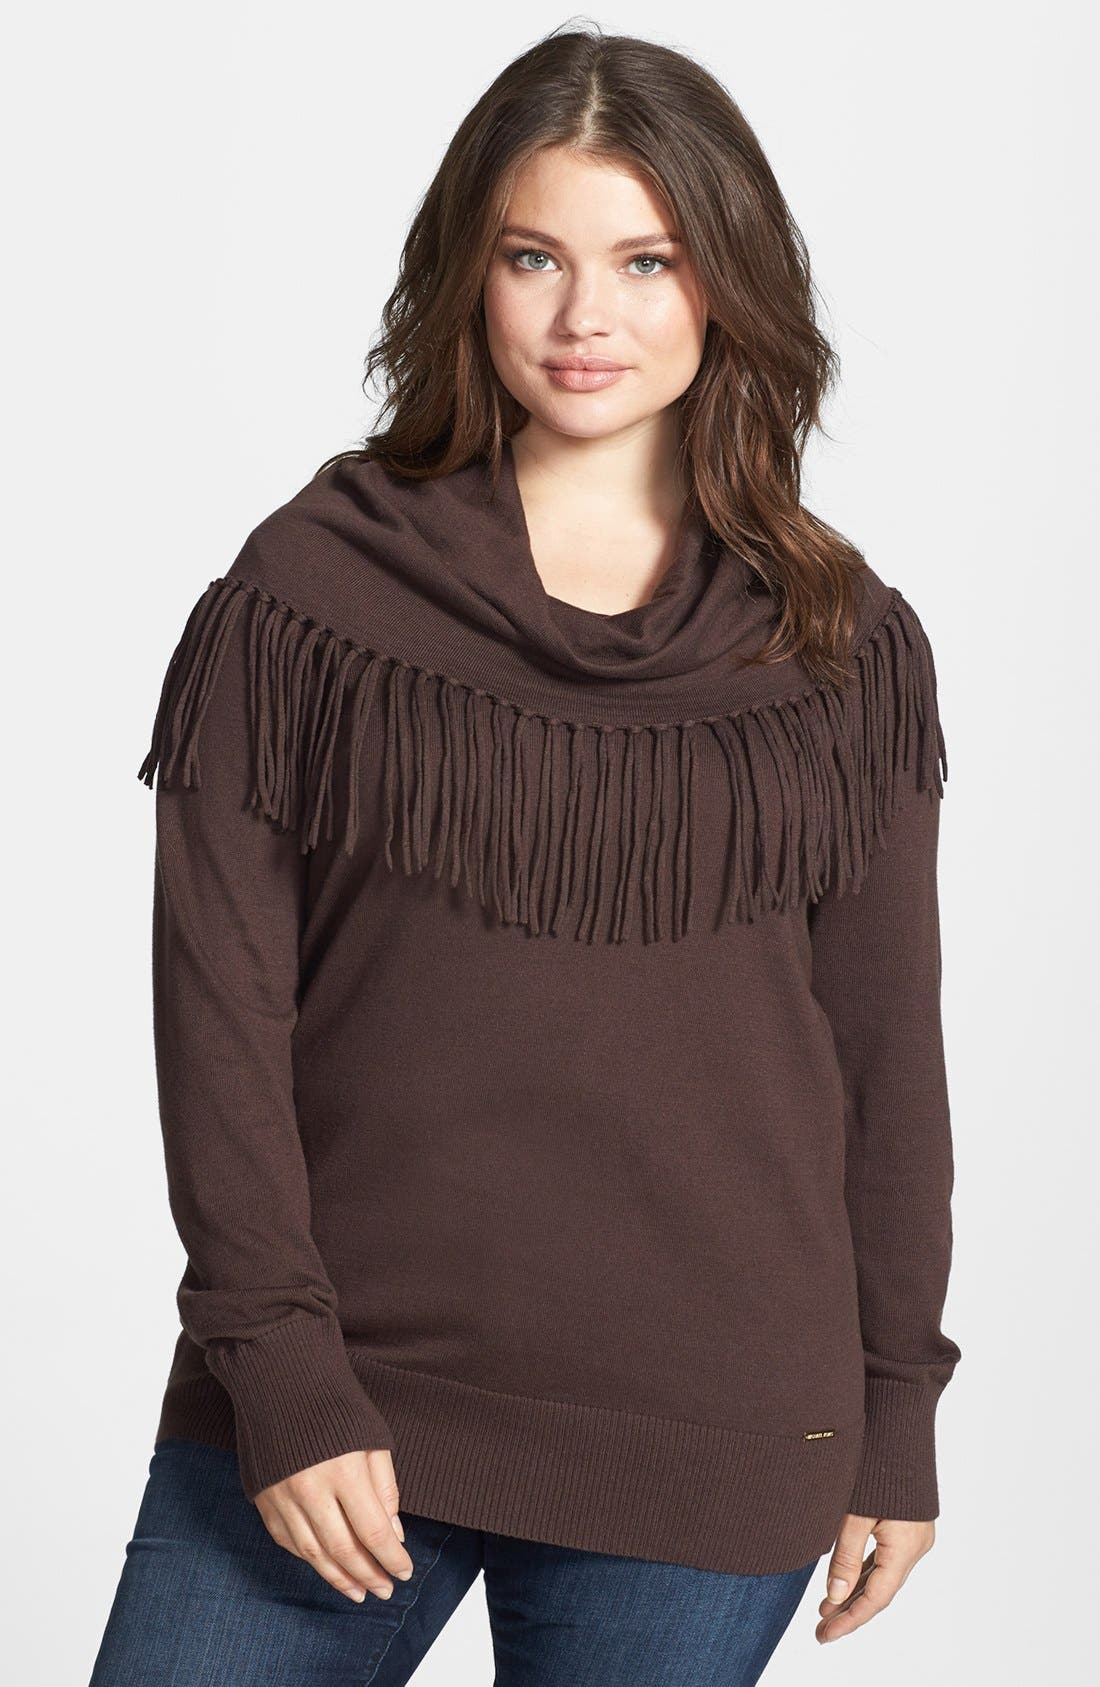 Alternate Image 1 Selected - MICHAEL Michael Kors Fringed Cowl Neck Sweater (Plus Size)